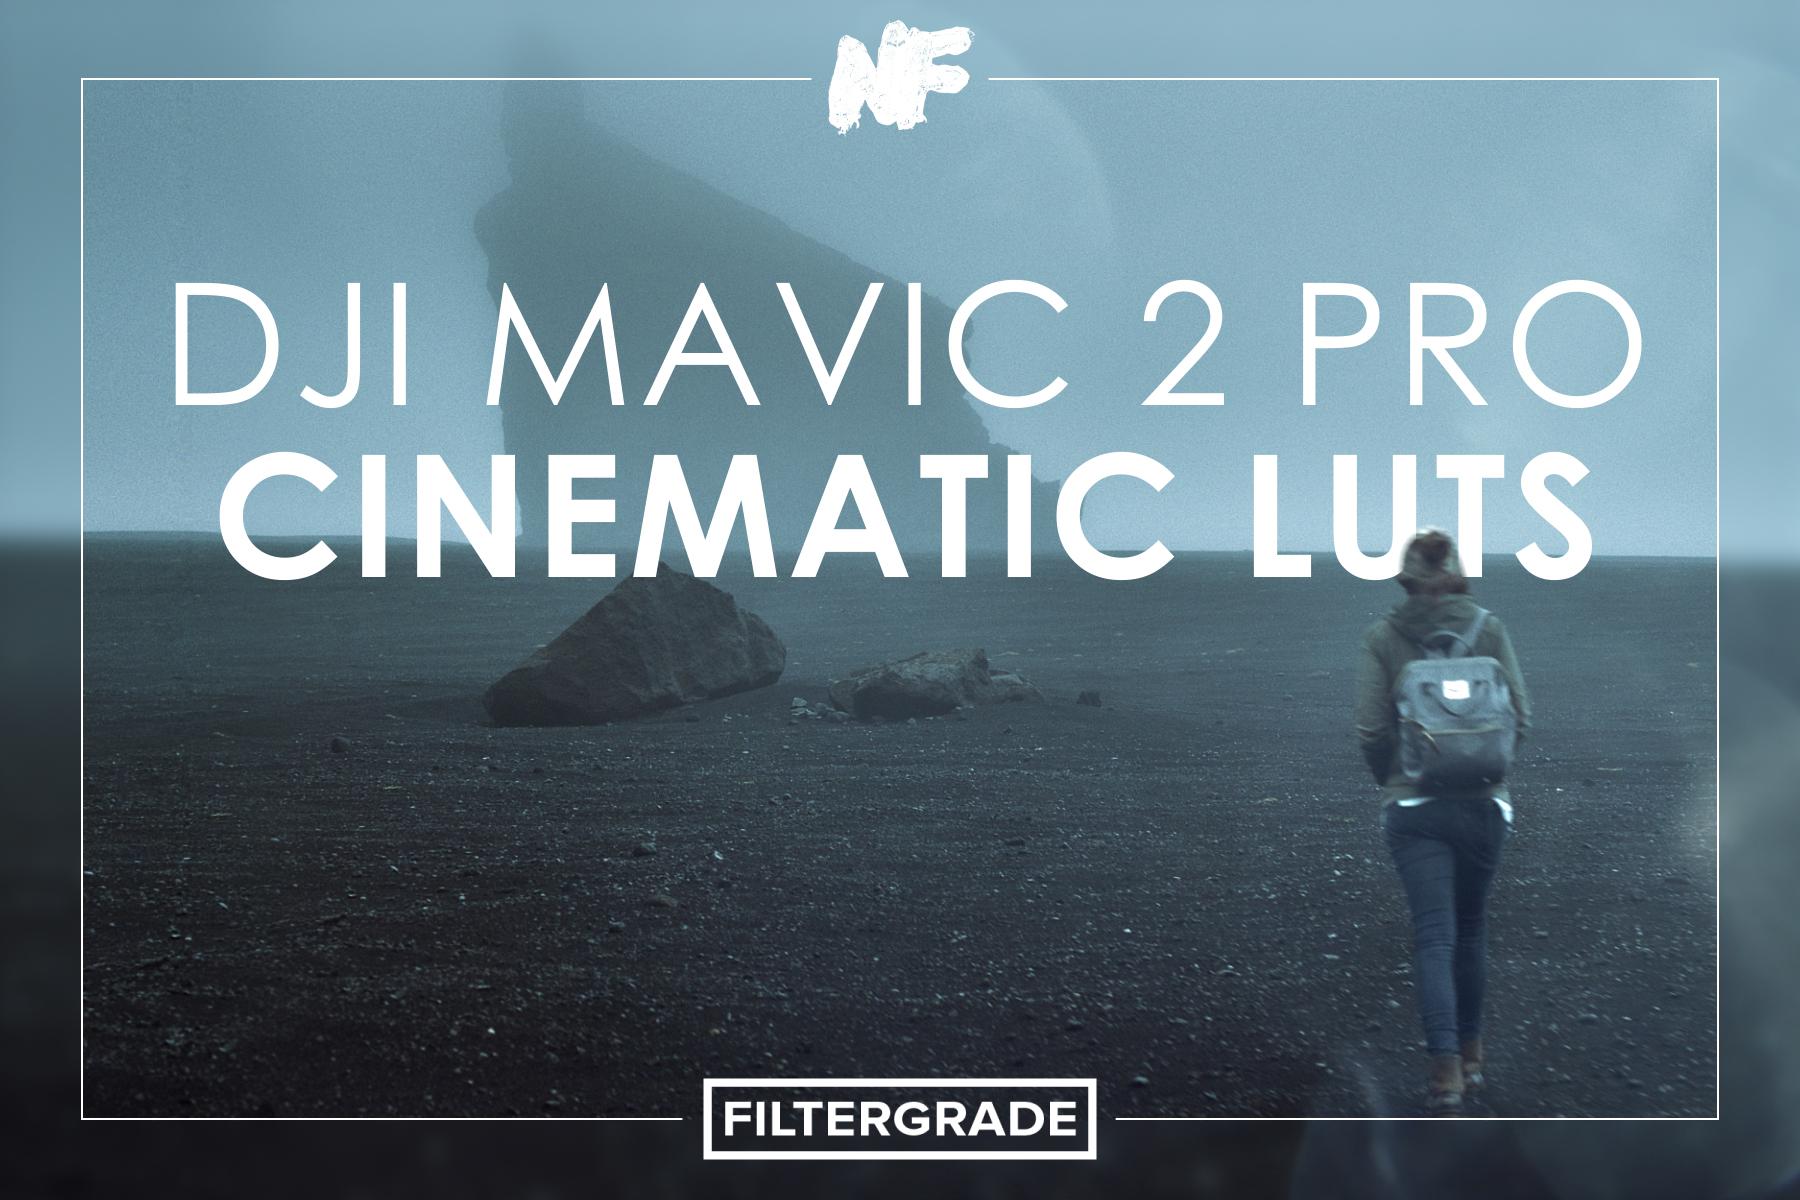 DJI Mavic 2 Pro Cinematic LUTs by Neumann Films